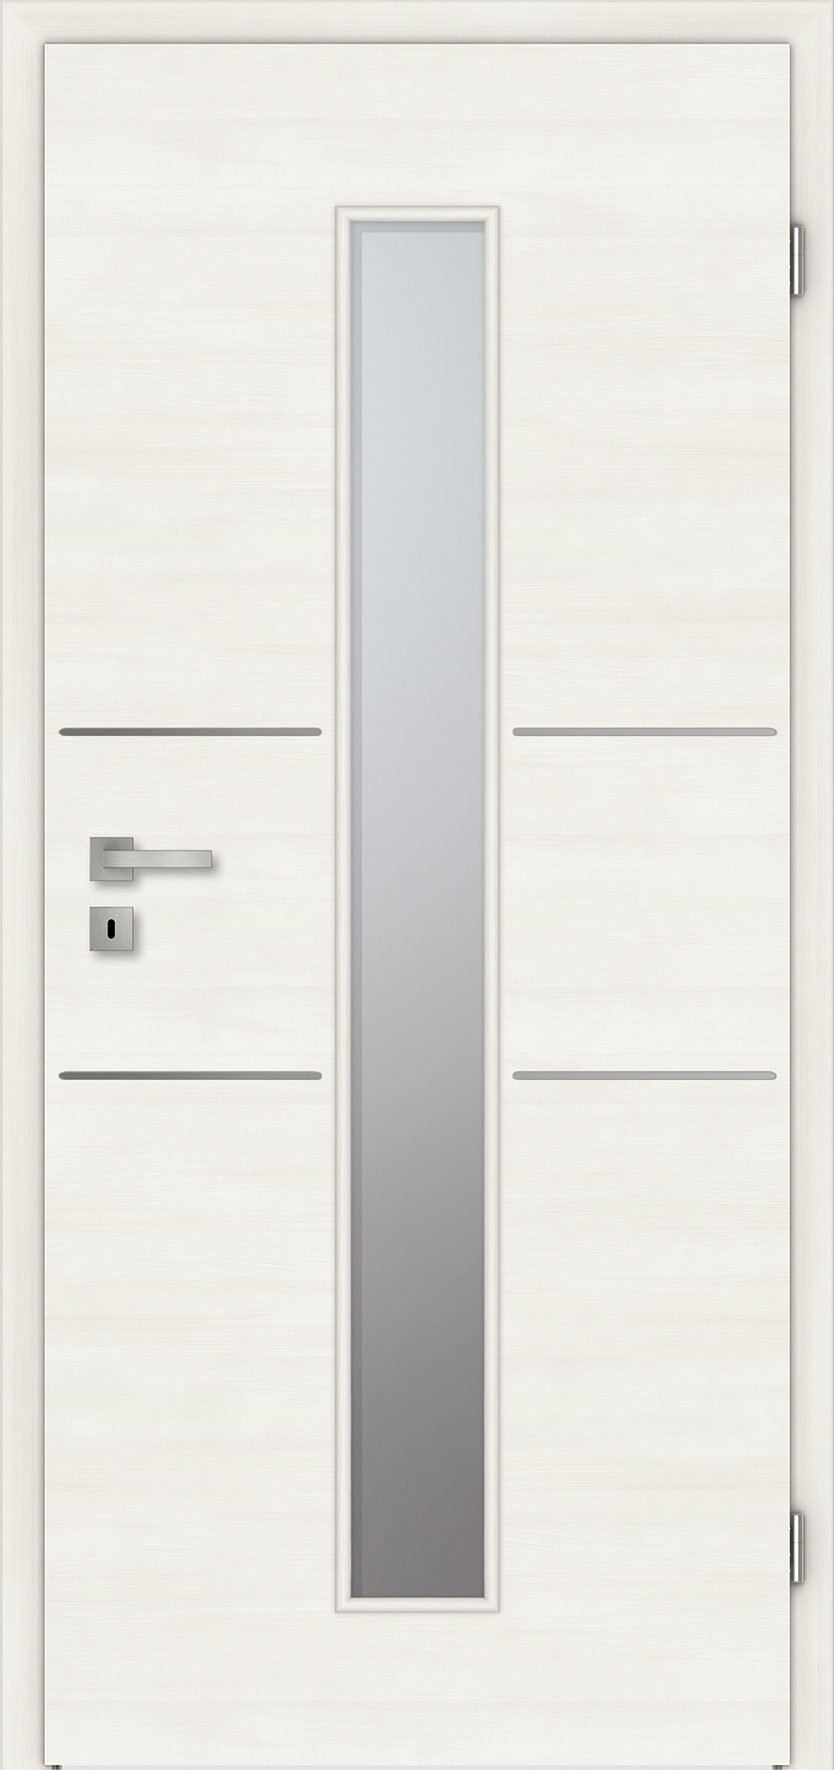 RY-533-LA2-DQ_CPL Touch Whiteline